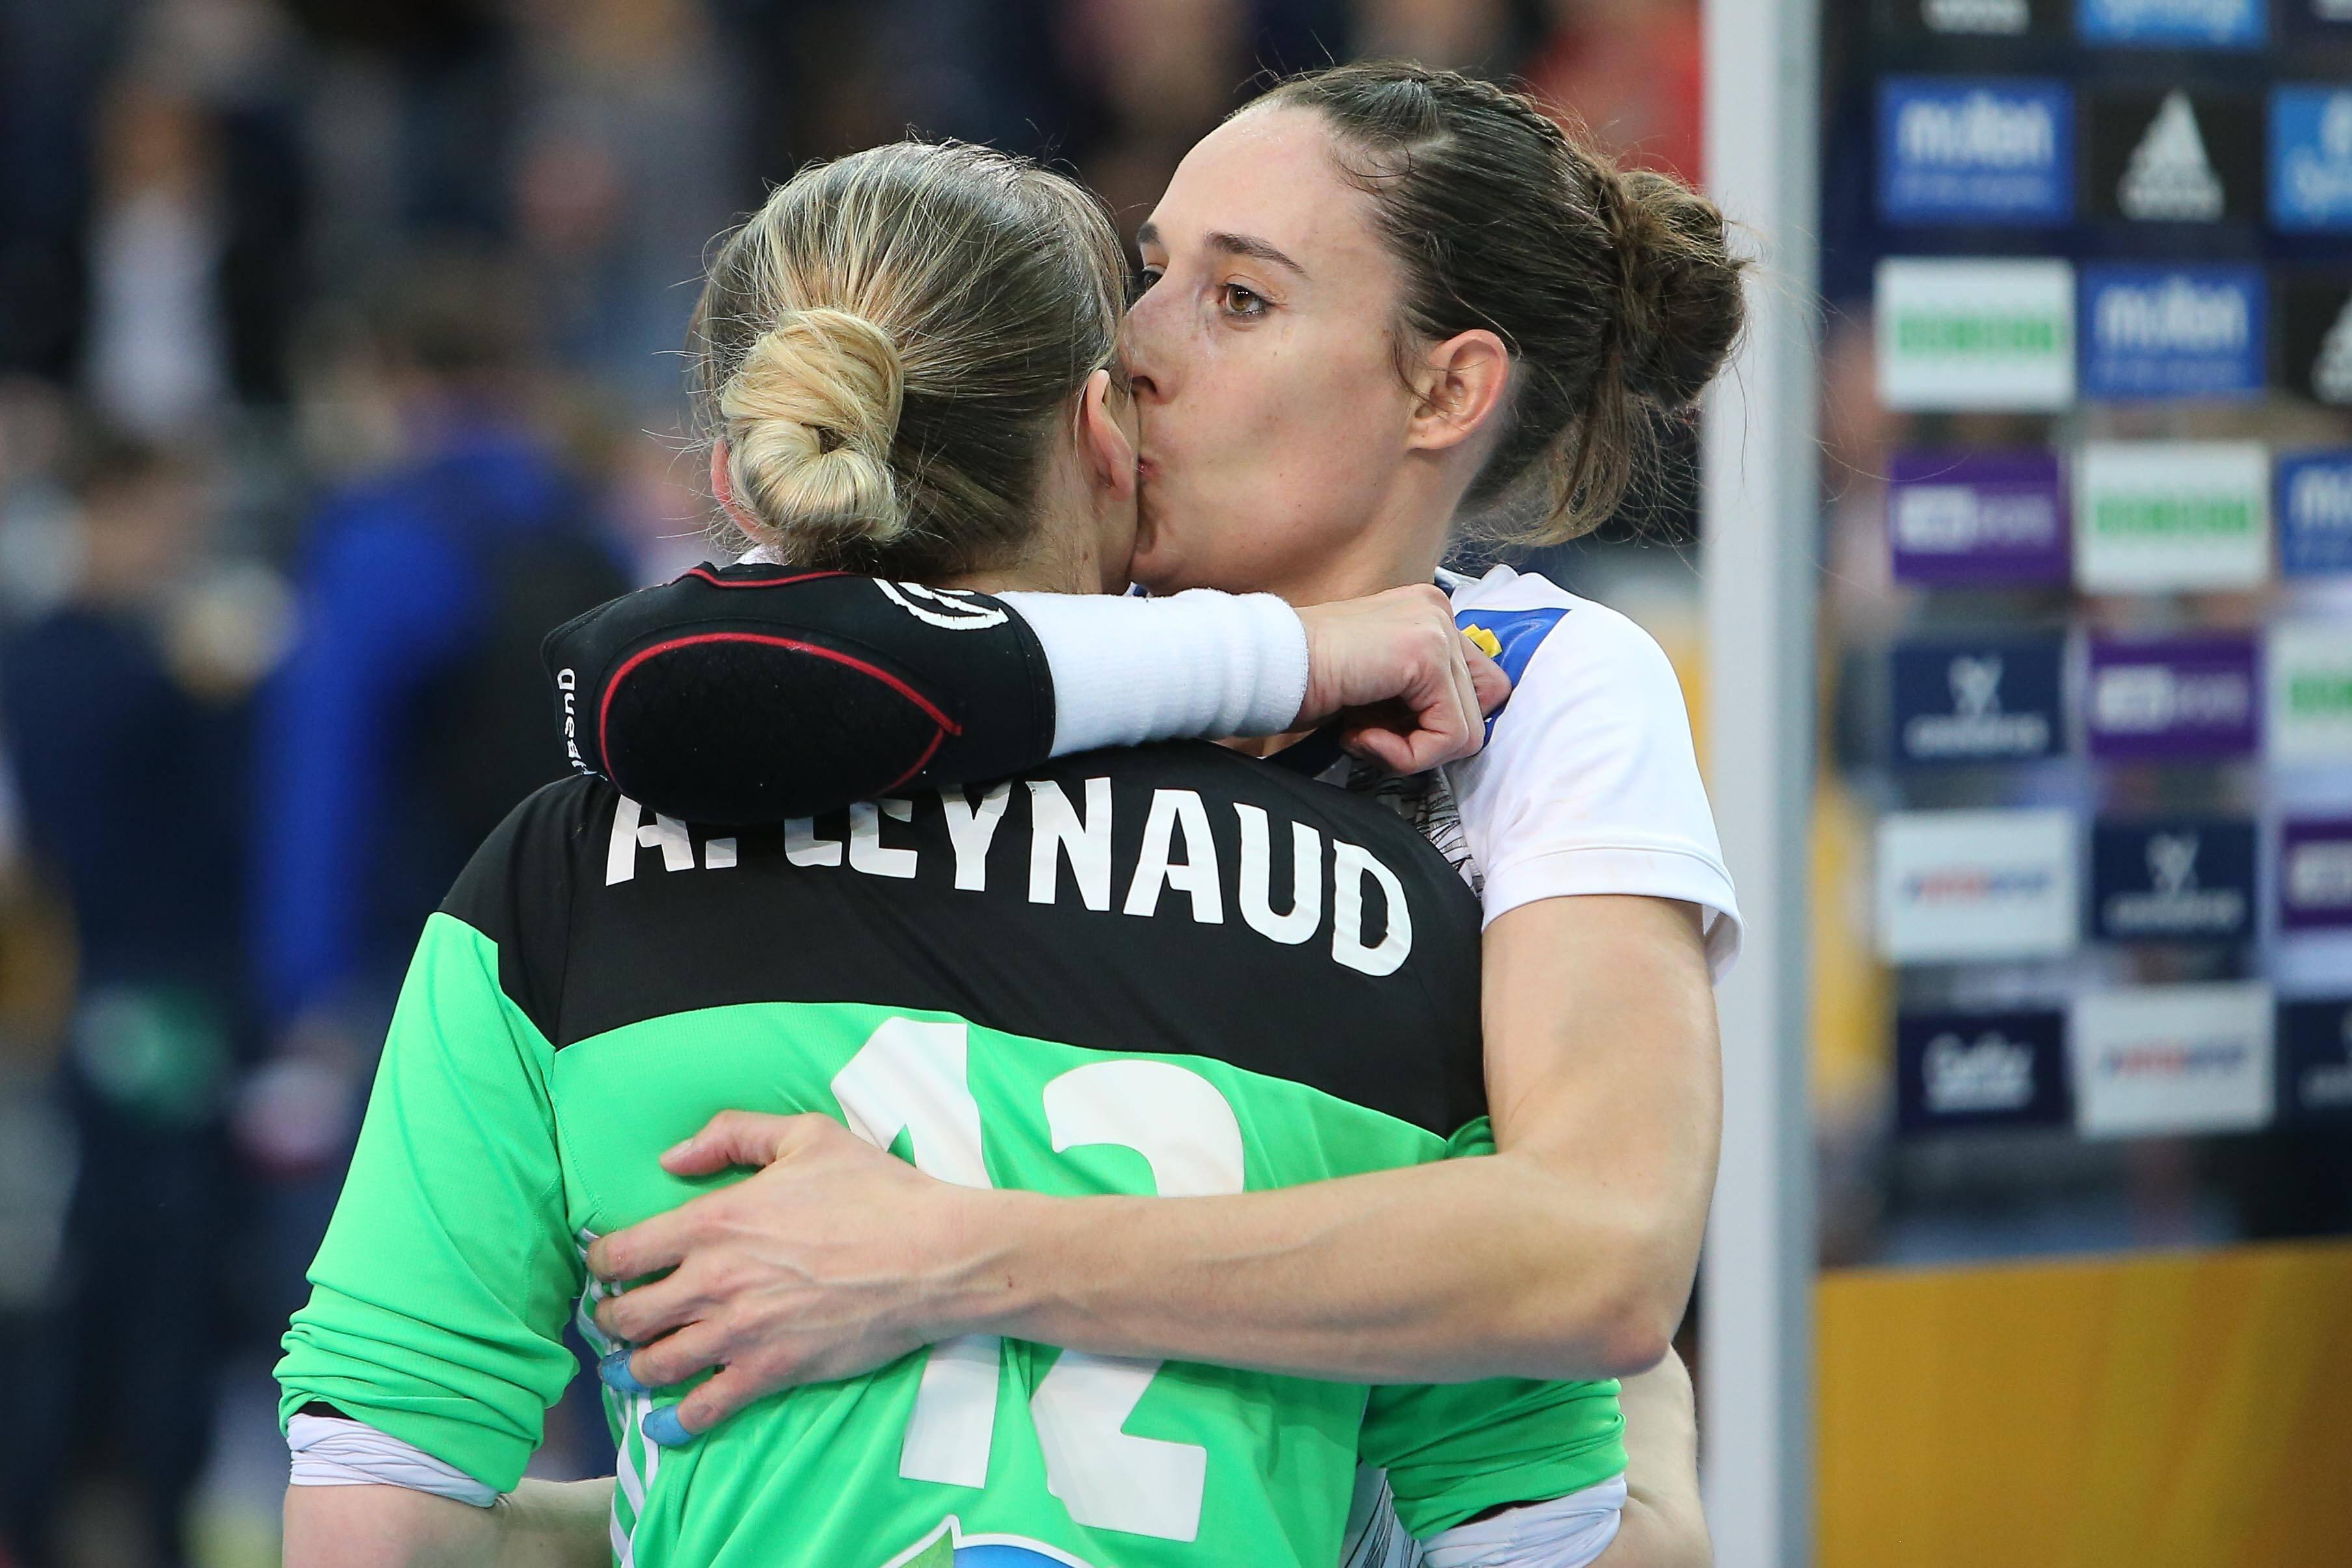 Handball - Equipe de France - Leynaud-Ayglon, un beau roman d'amitié